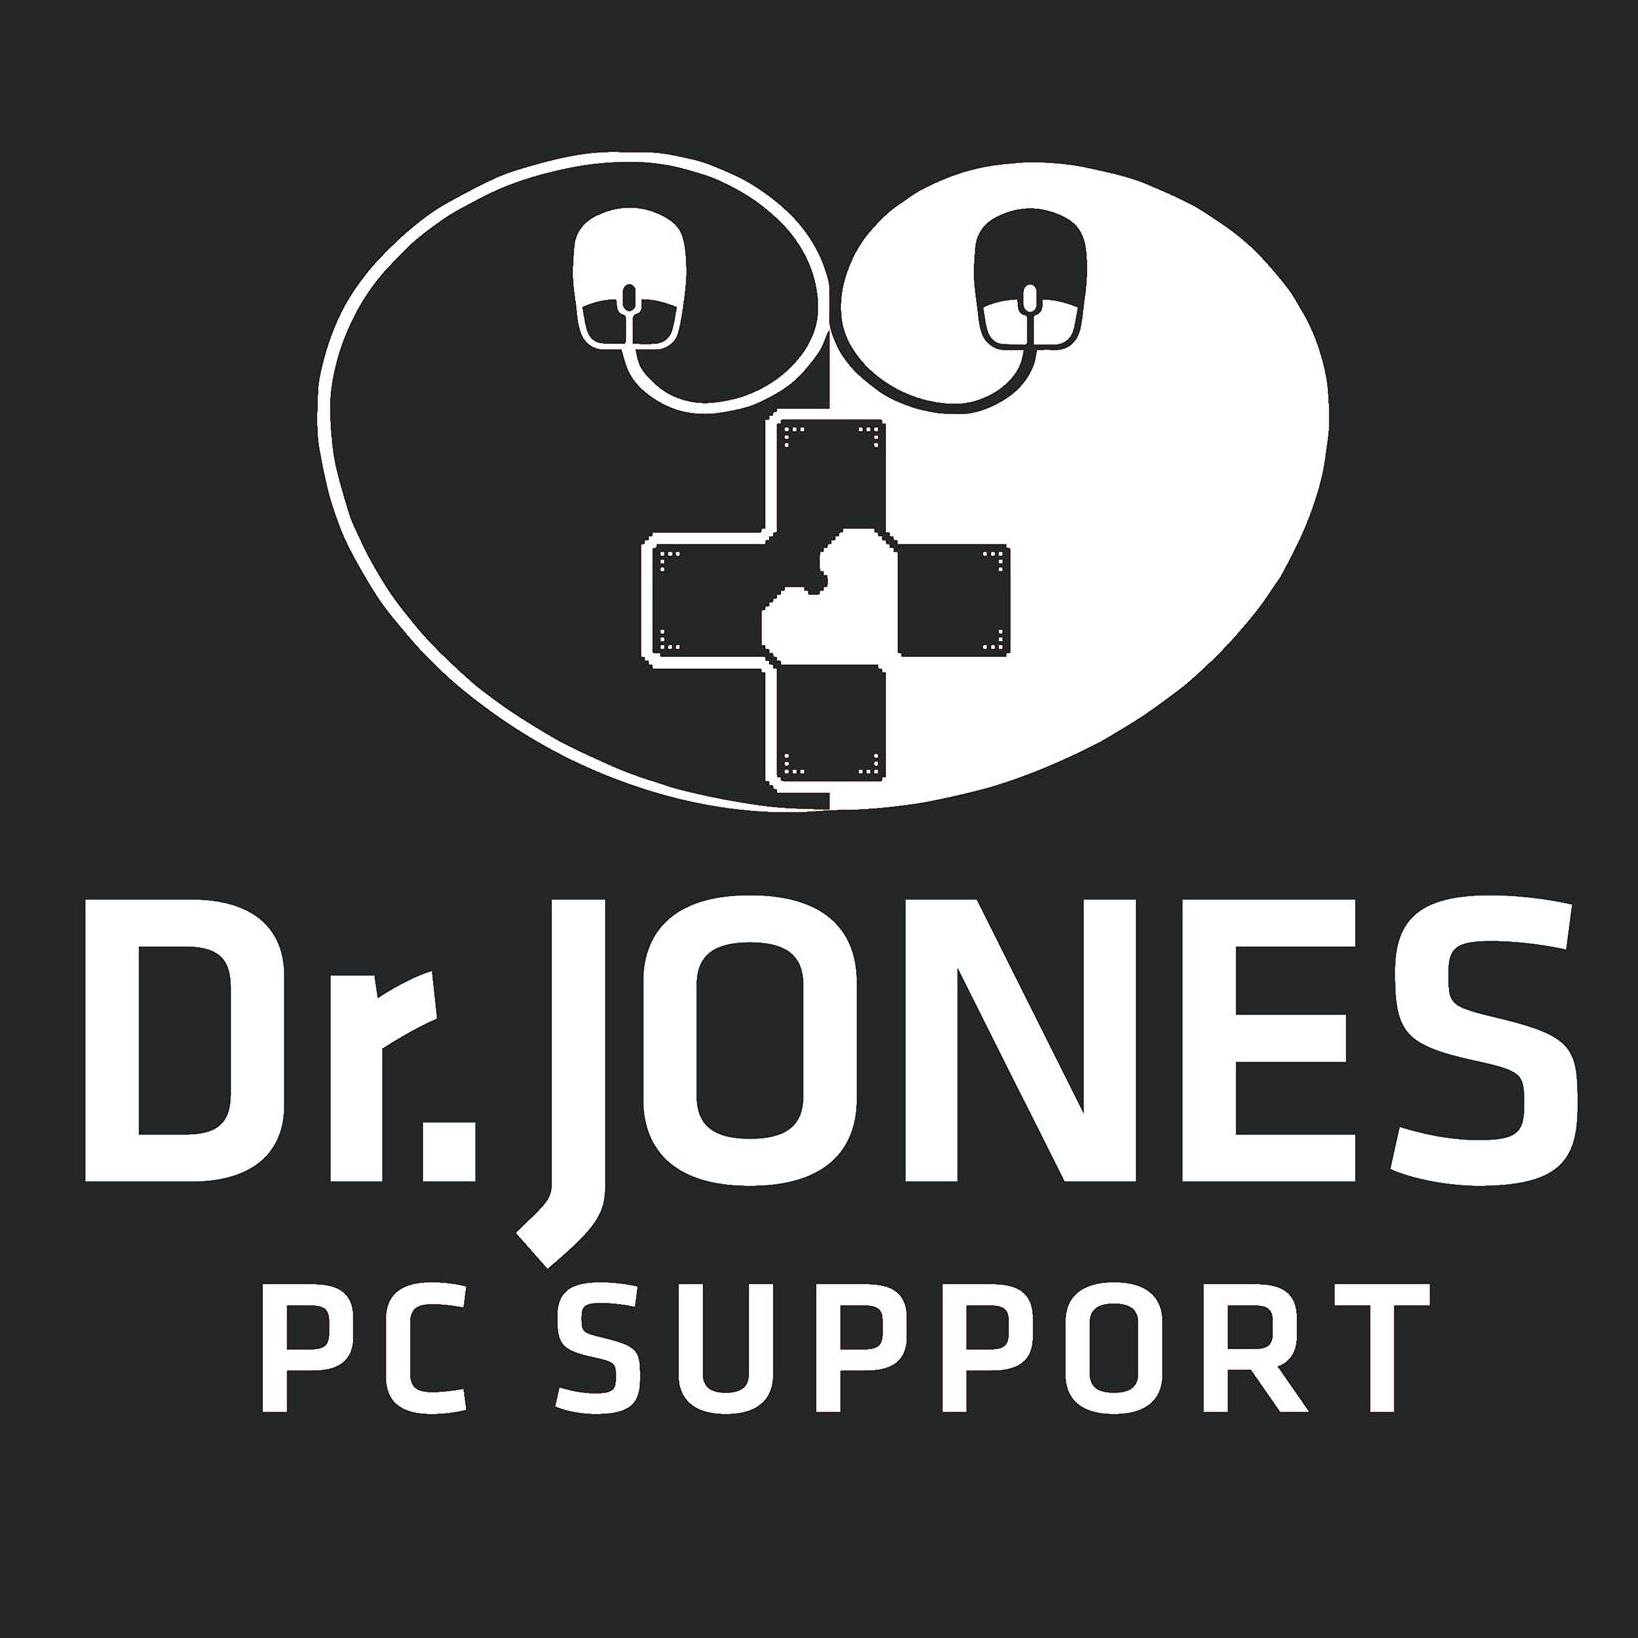 Logo of Dr Jones PC Support